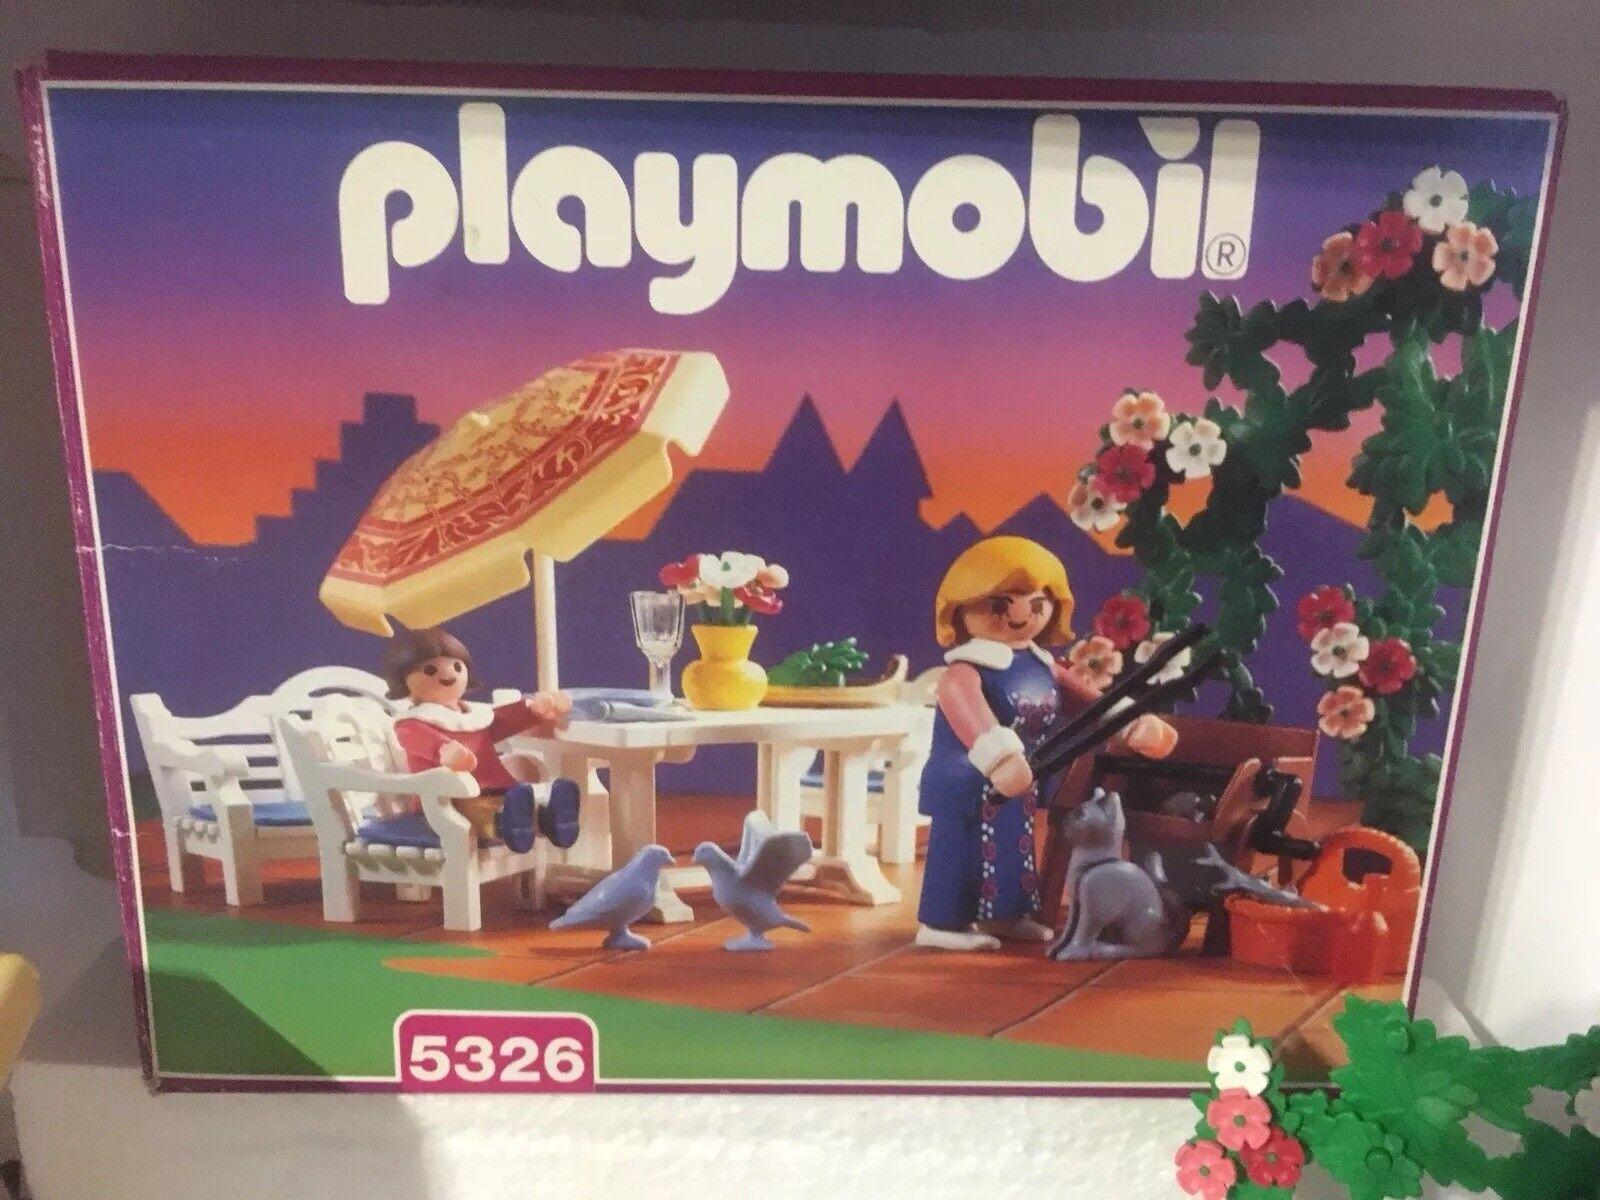 Playmobil Terrassenset 5326 Nostalgie zu 5300 Rosa Serie